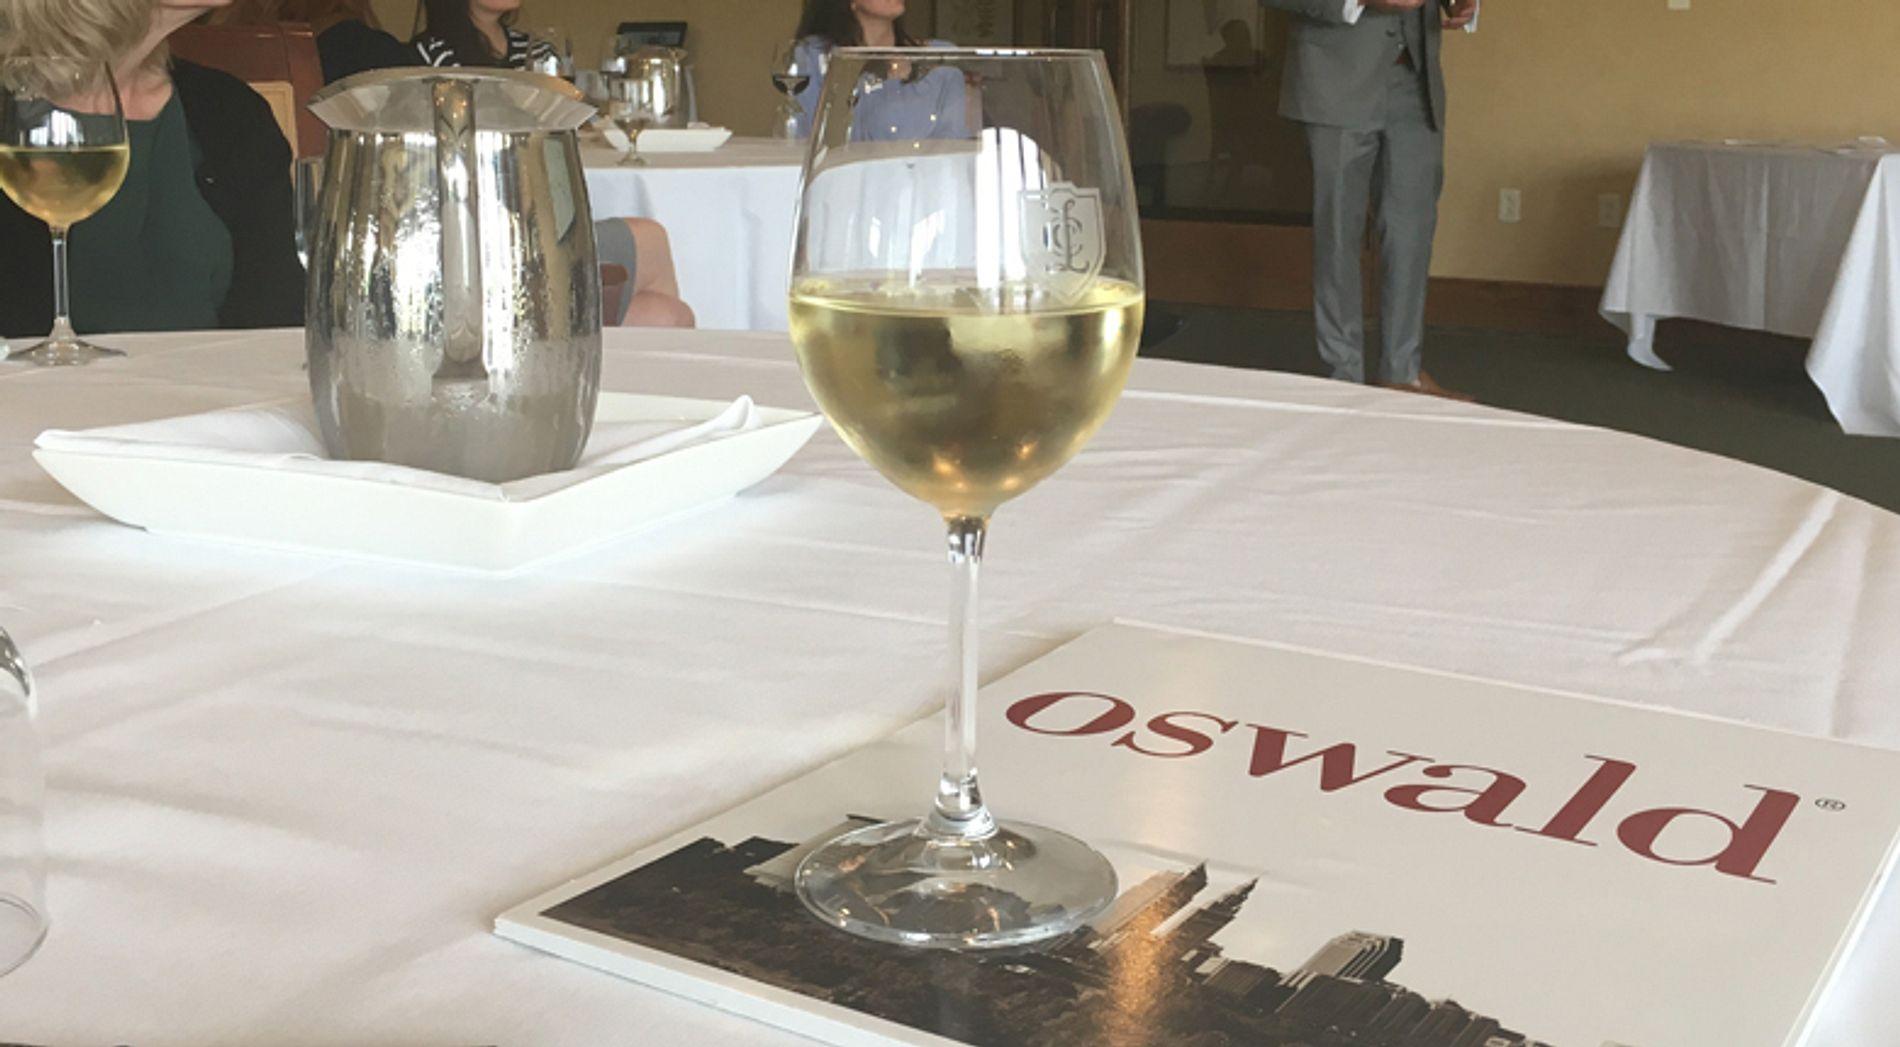 Wine Glass on Oswald brochure